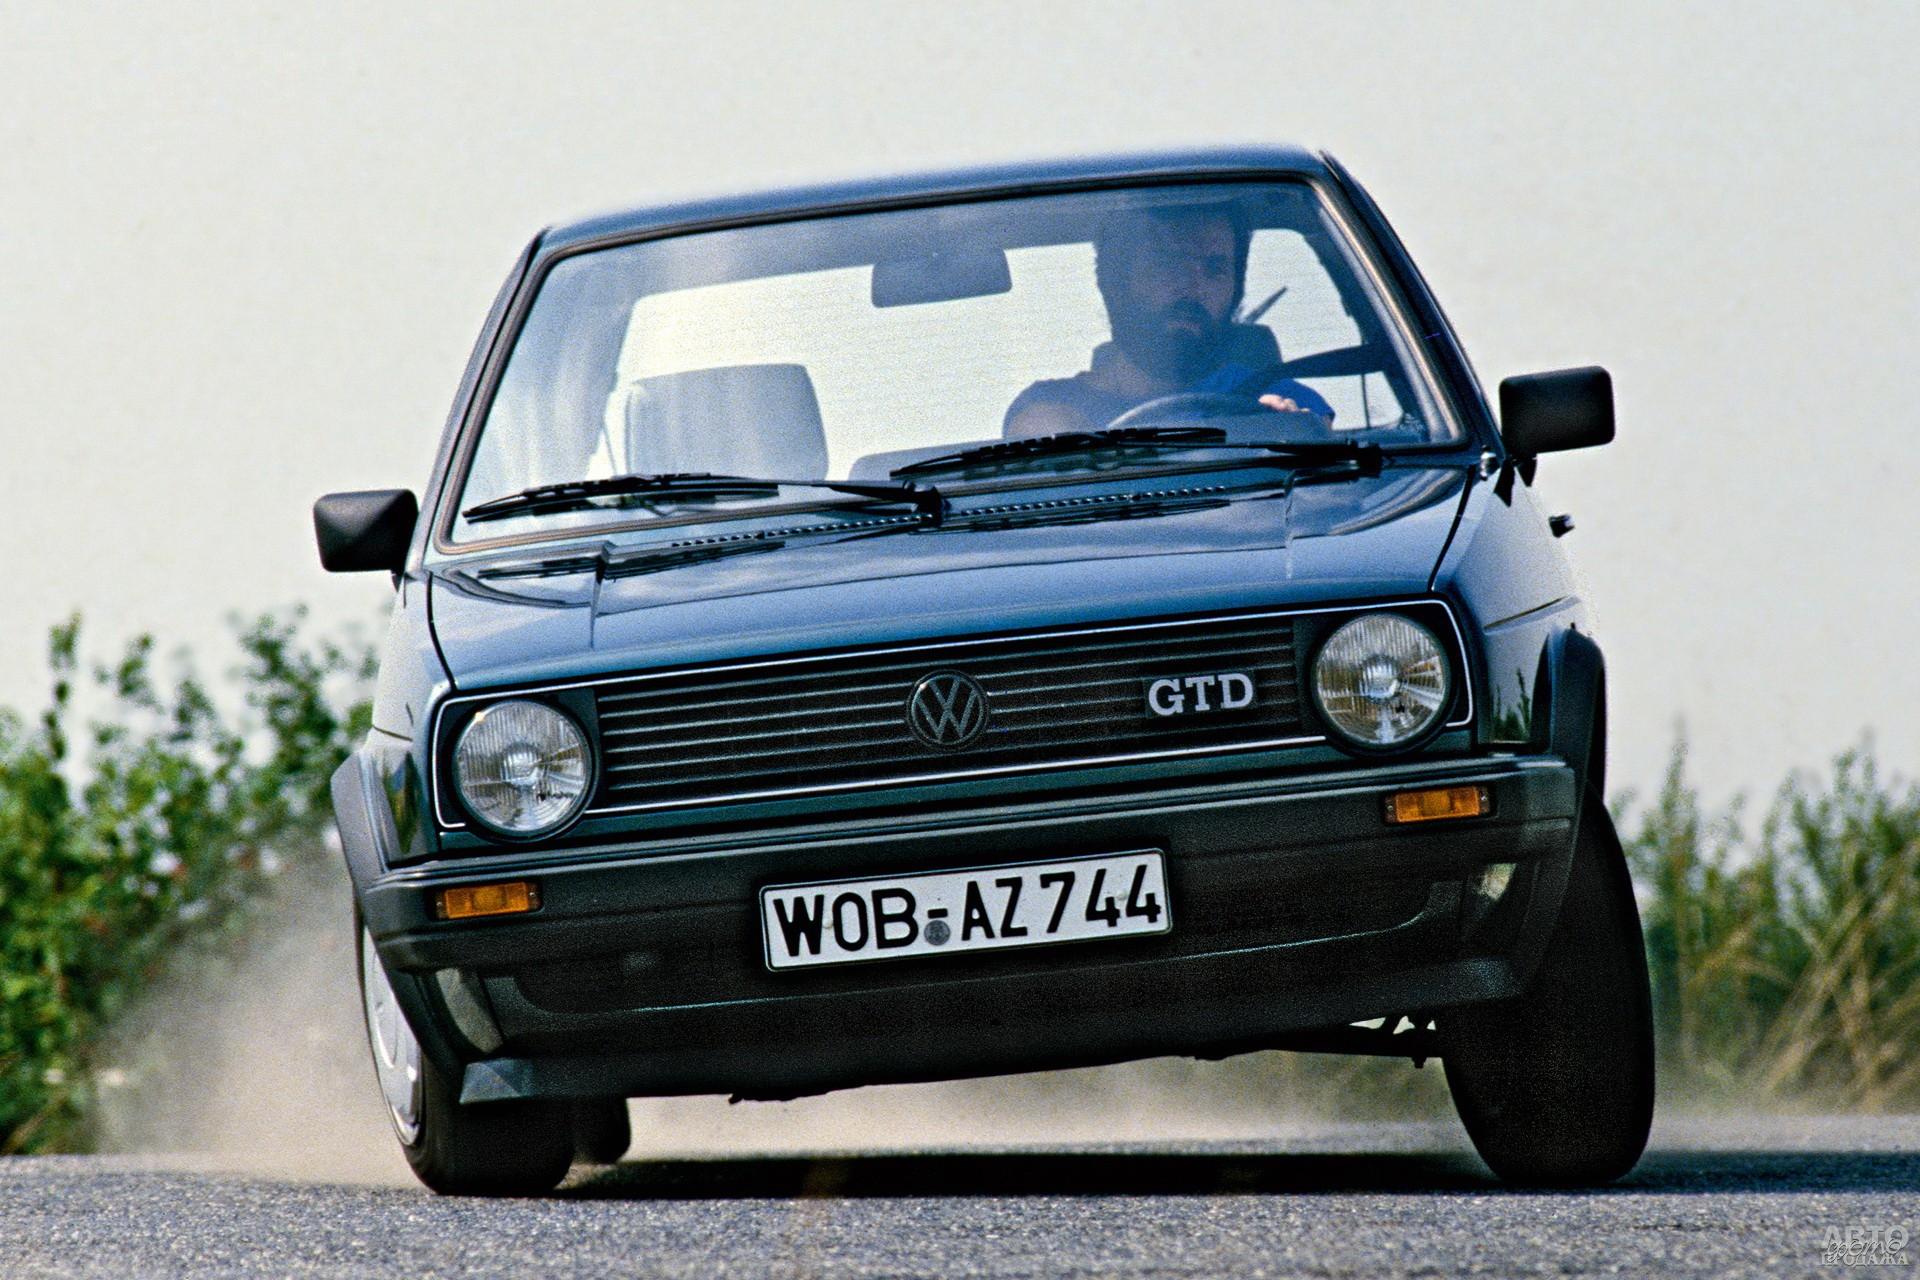 Дизельный Volkswagen Golf GTD 1985 года